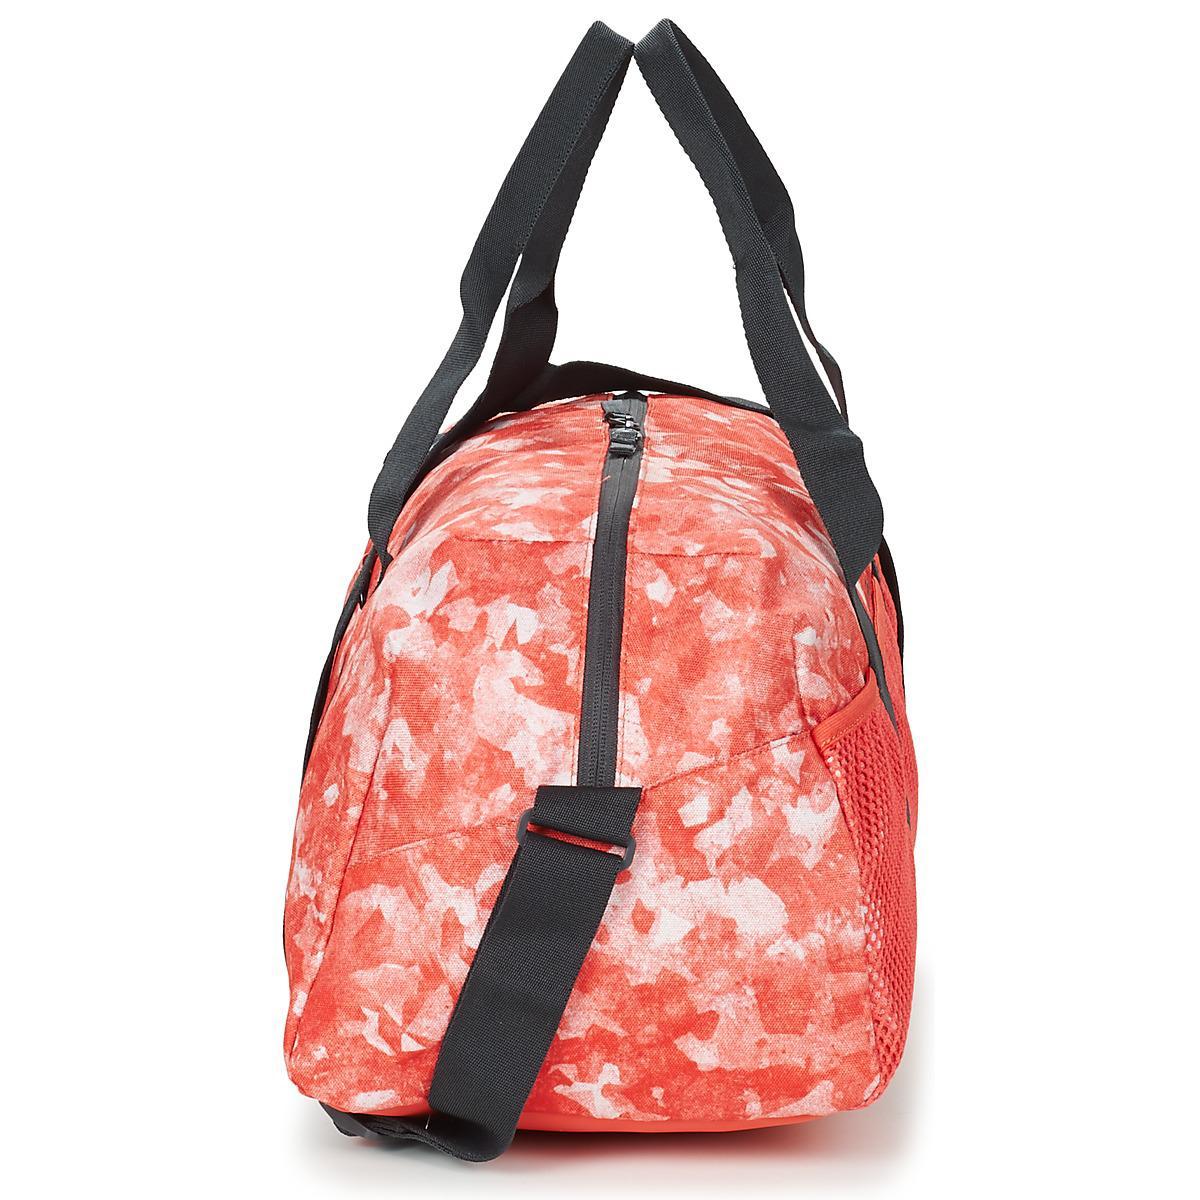 0500d186 Adidas Training Duffle Small Women's Sports Bag In Orange